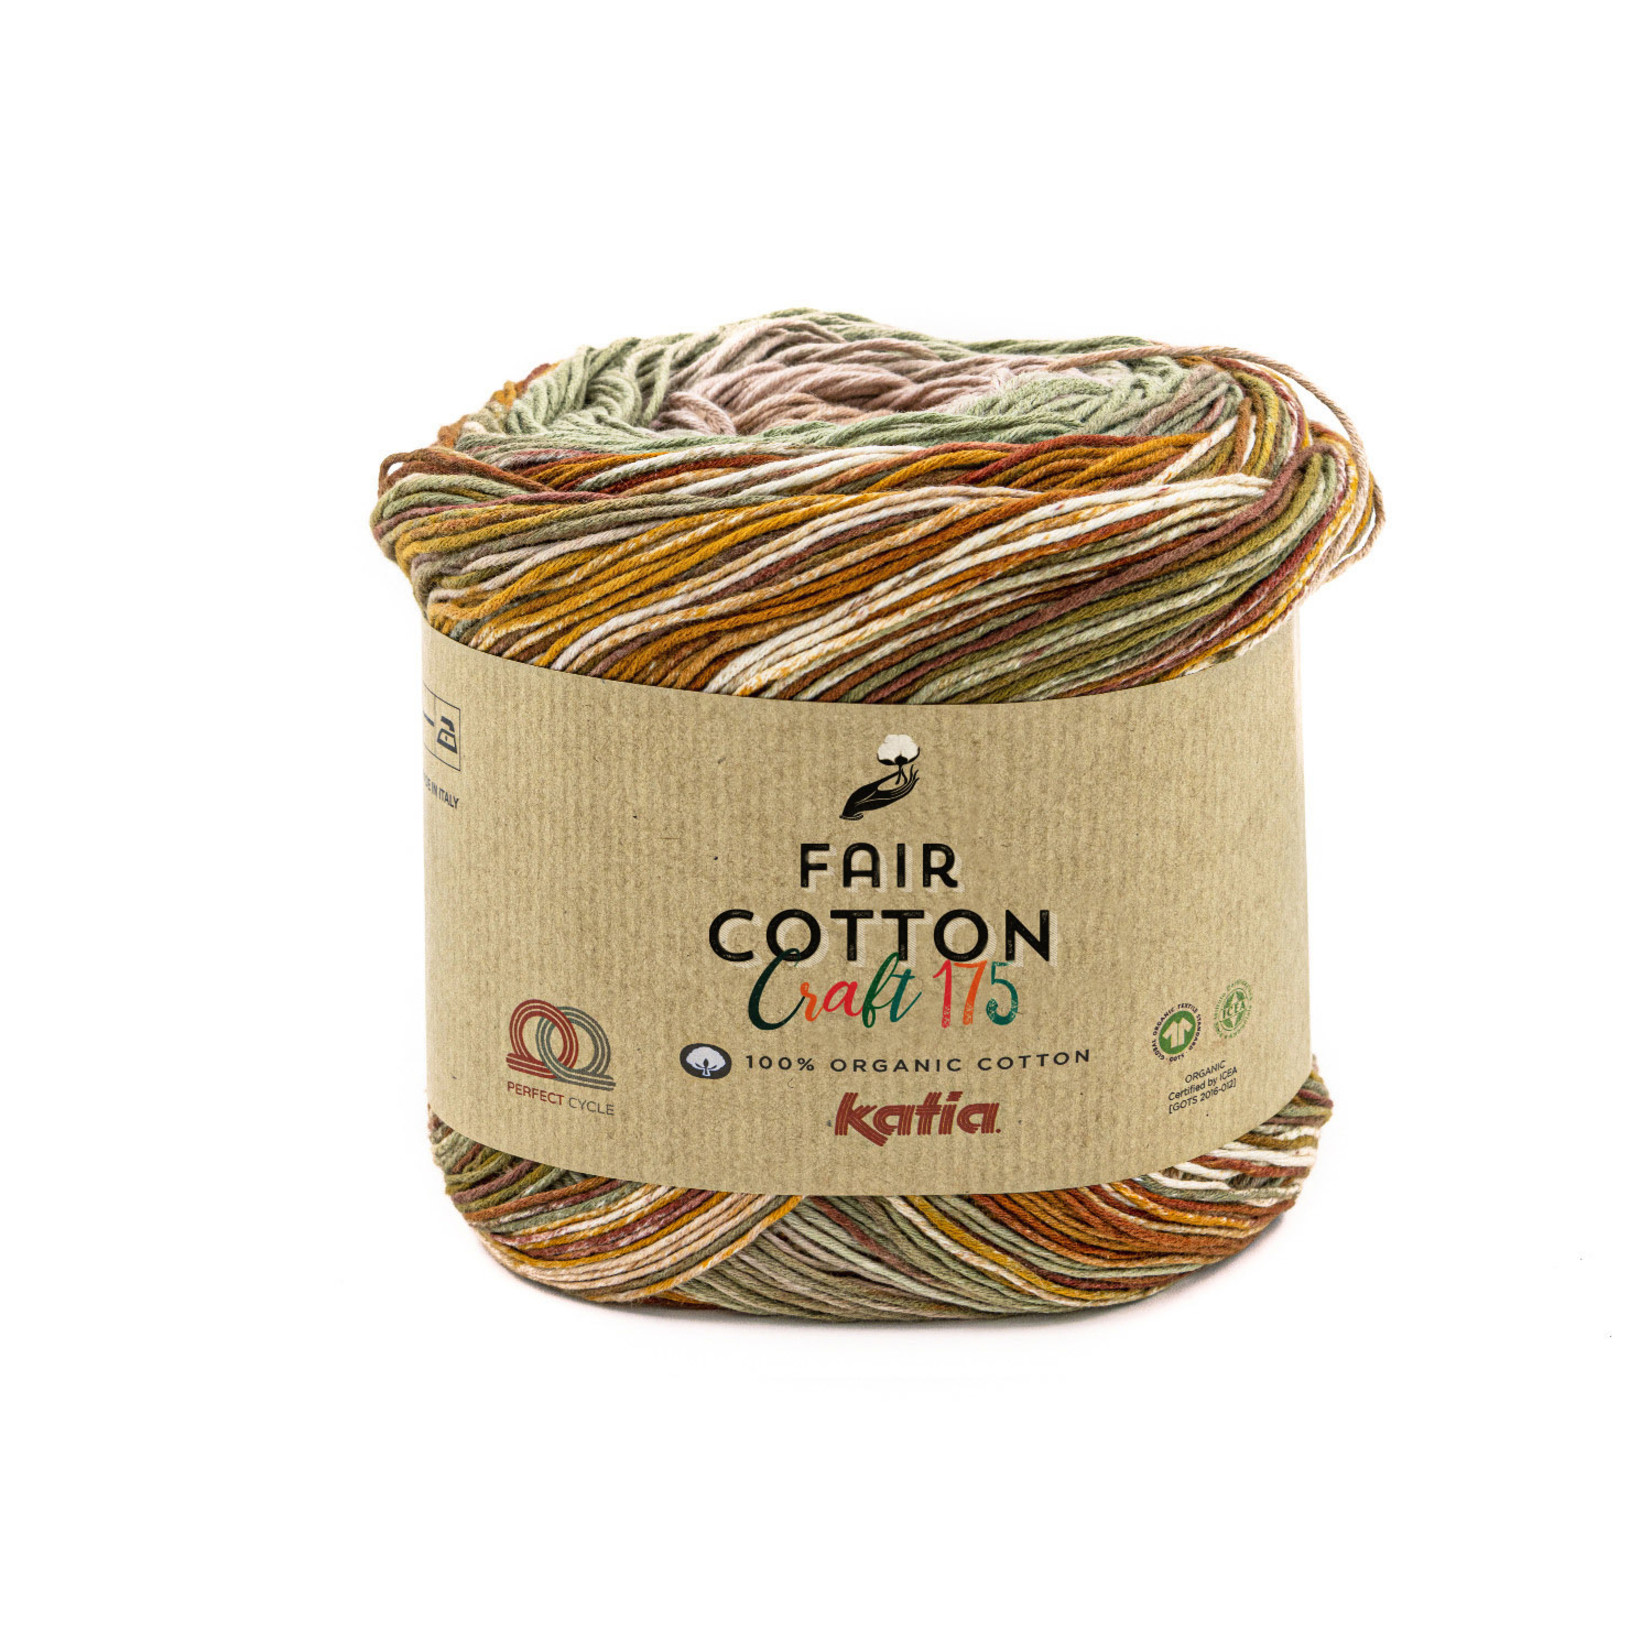 Katia Katia Fair Cotton Craft verloopgaren Kleur 800 - 175 gr.